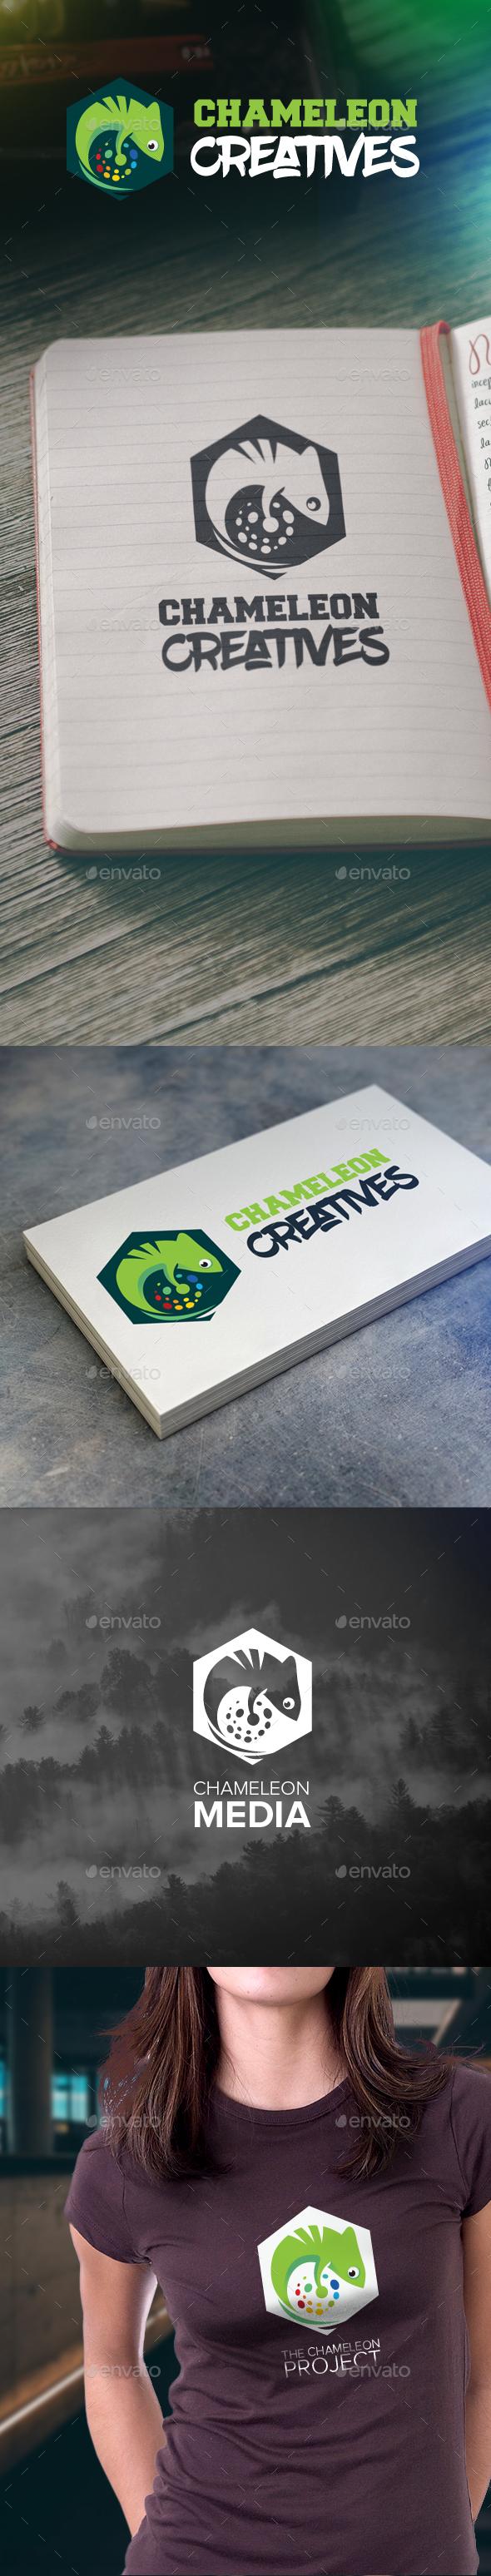 Chameleon Creatives Logo - Logo Templates